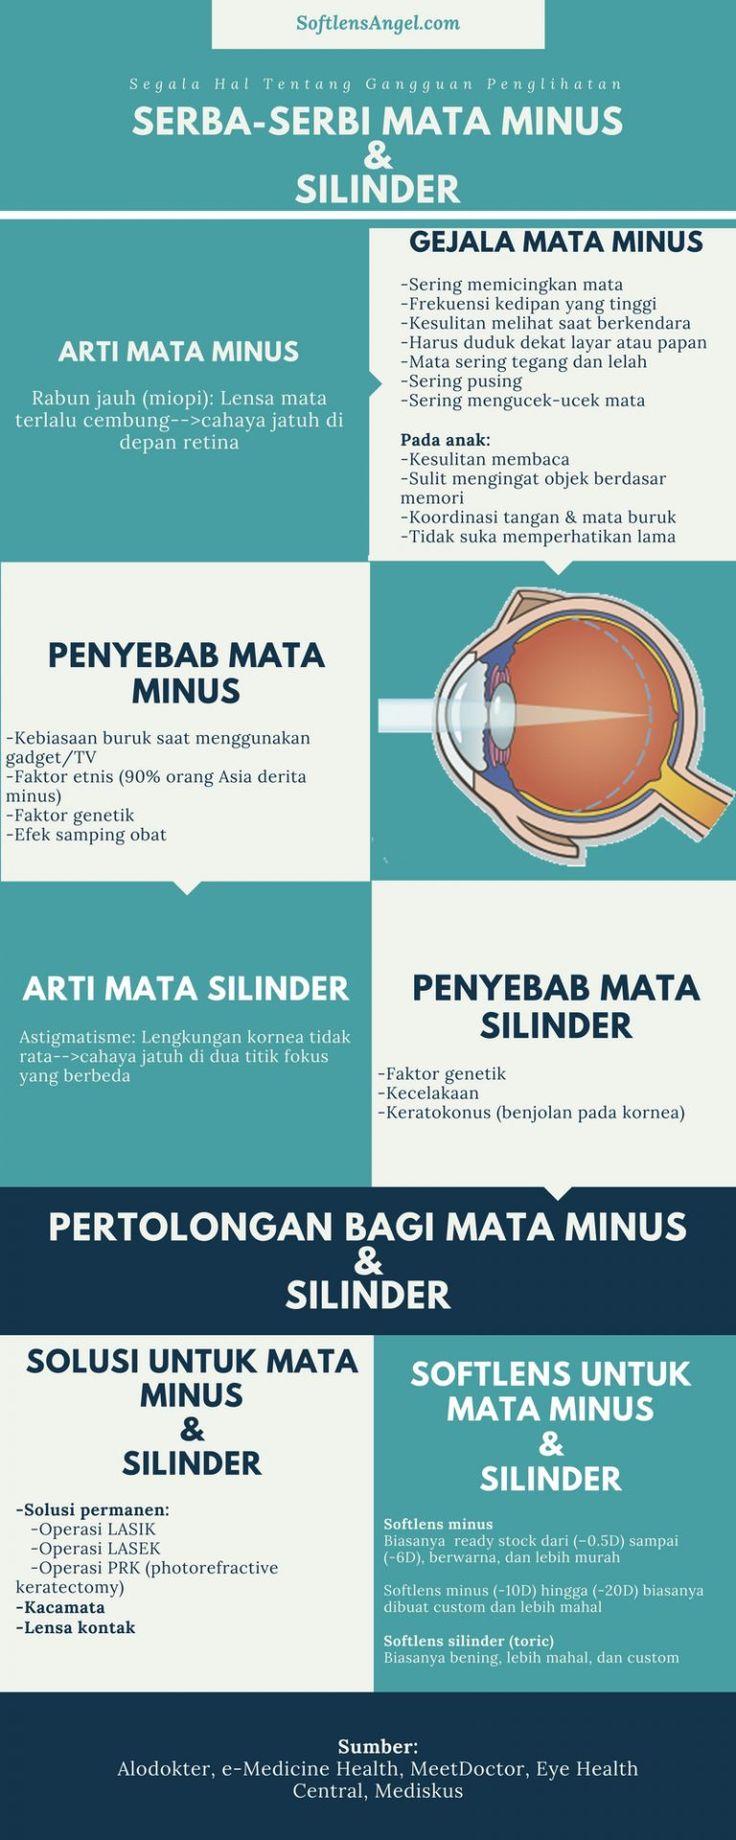 Kenali penyebab mata minus – kelainan, gejala dan solusi mengatasinya